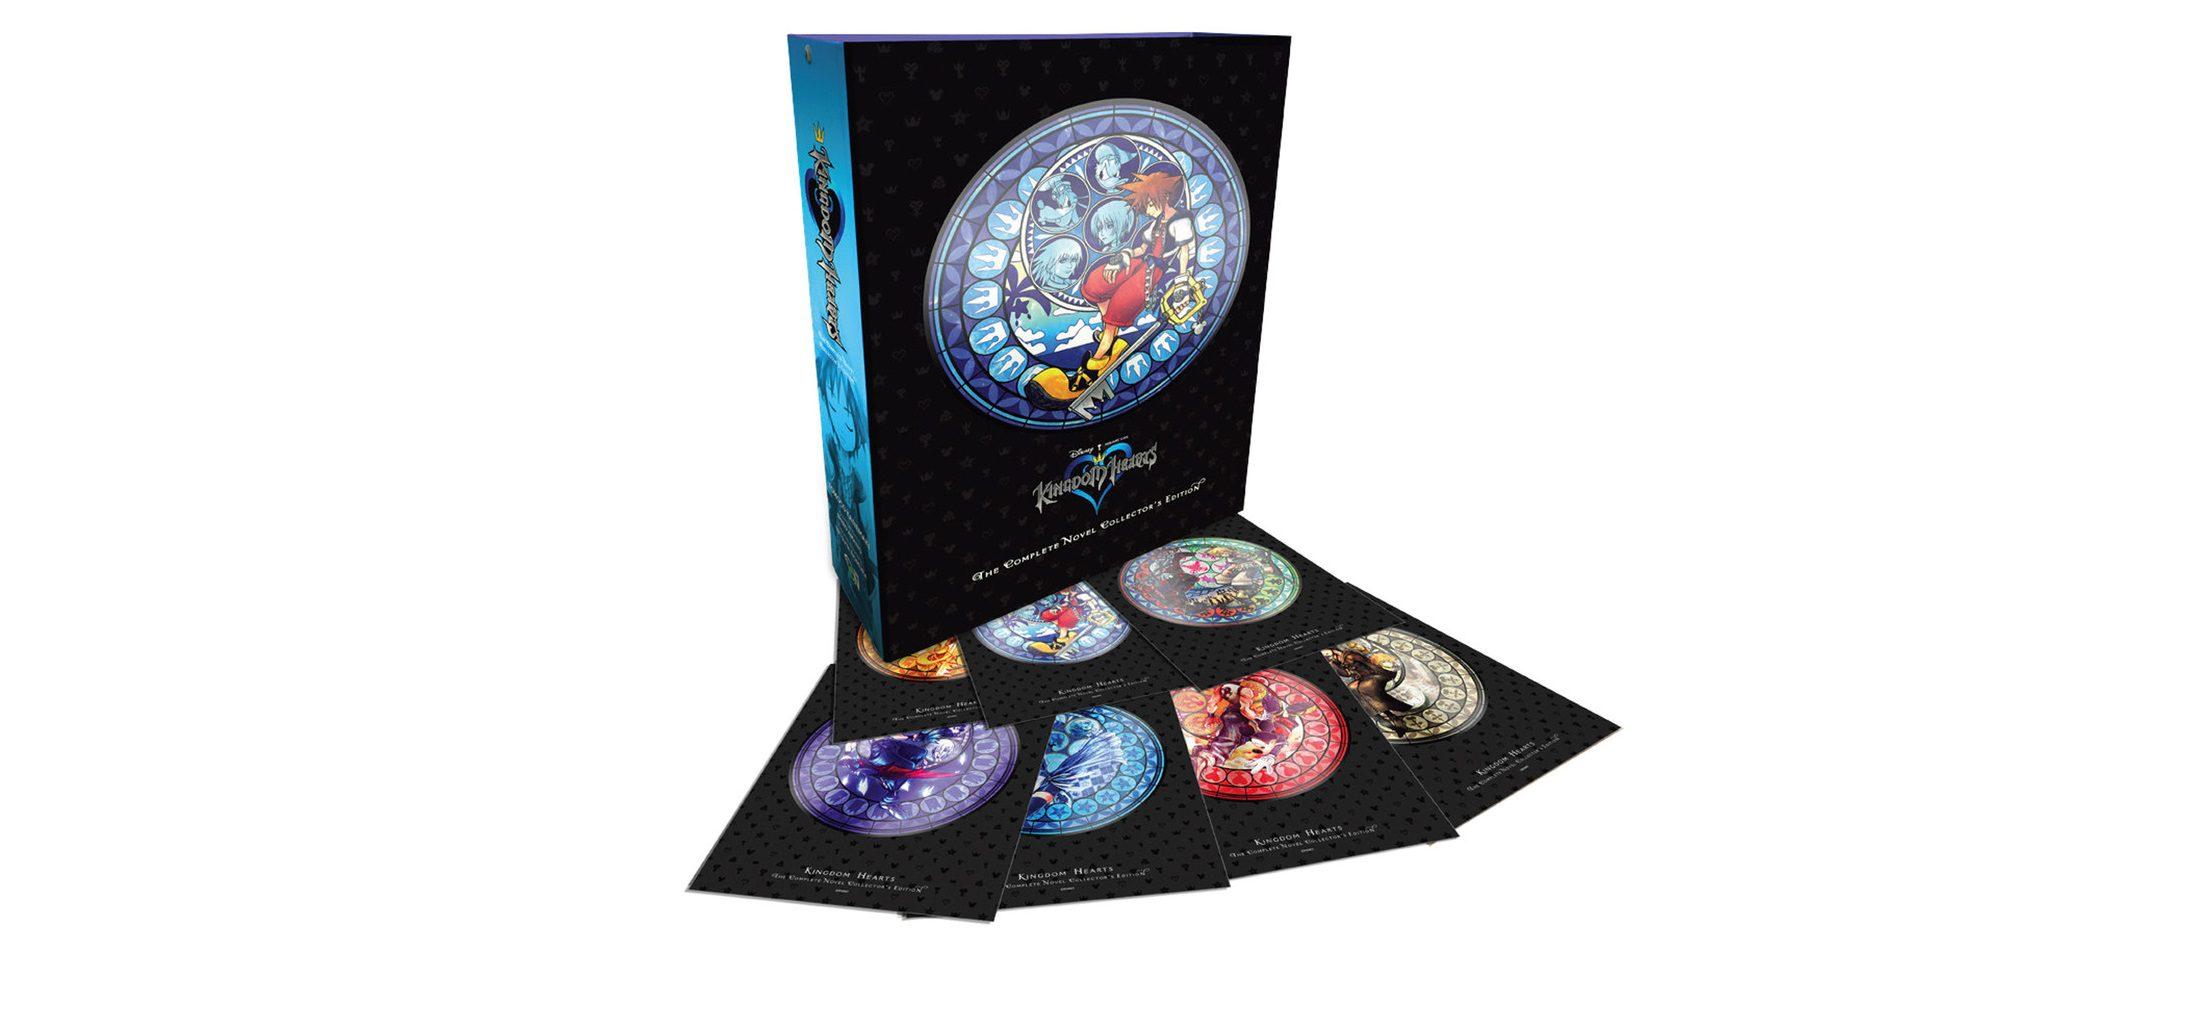 Kingdom Hearts novels